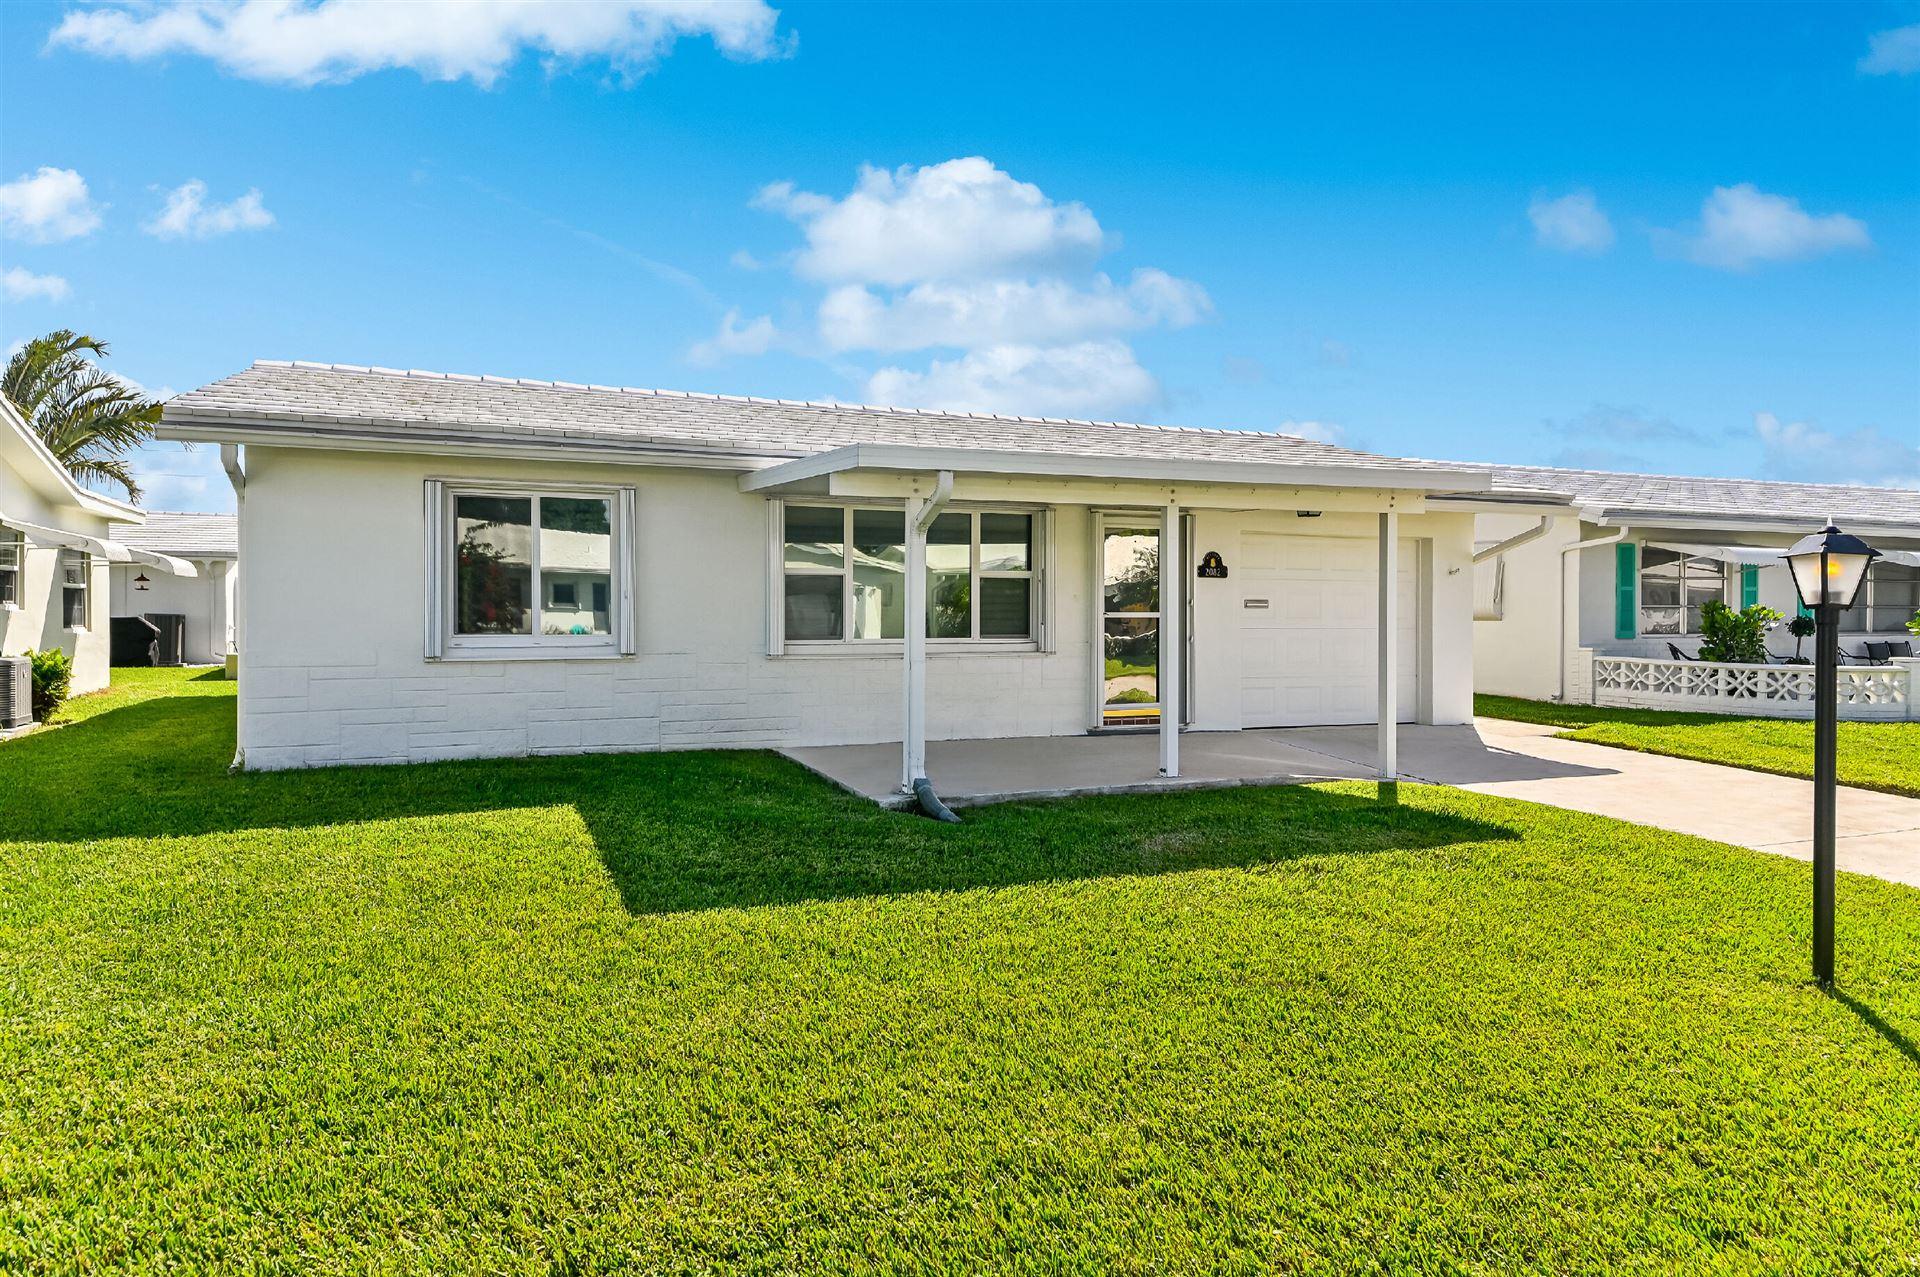 2082 SW 13th Ter Terrace, Boynton Beach, FL 33426 - MLS#: RX-10753810